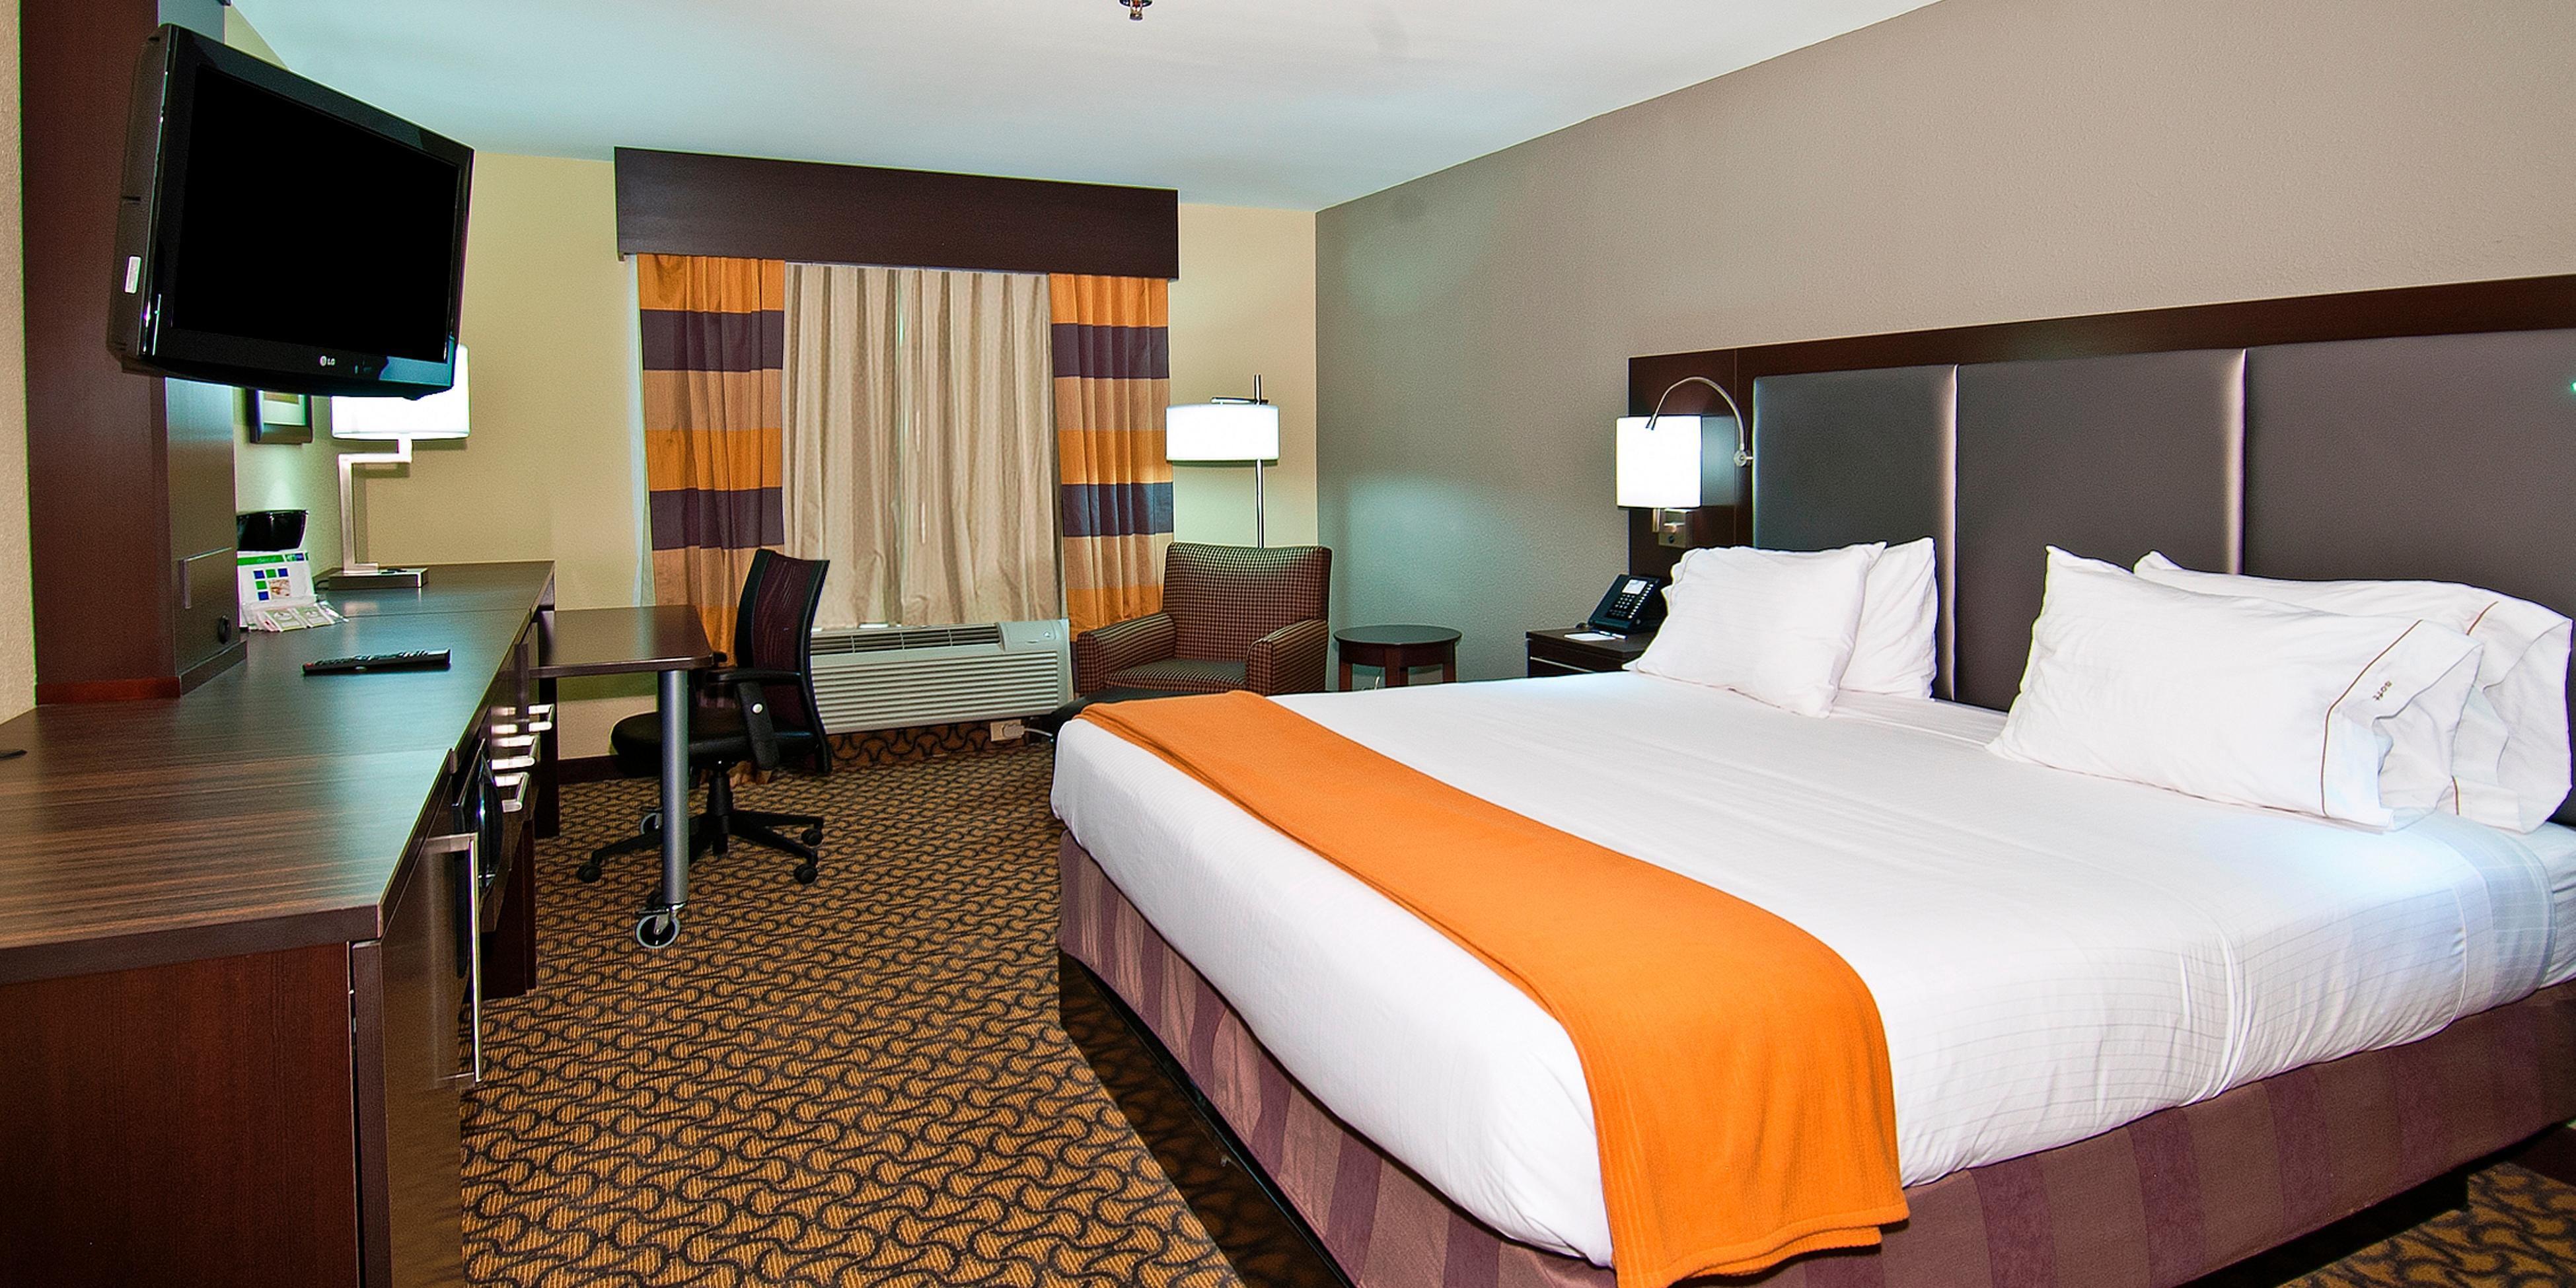 Mini Kühlschrank Pearl : Holiday inn express & suites jackson pearl intl airport ihg hotel